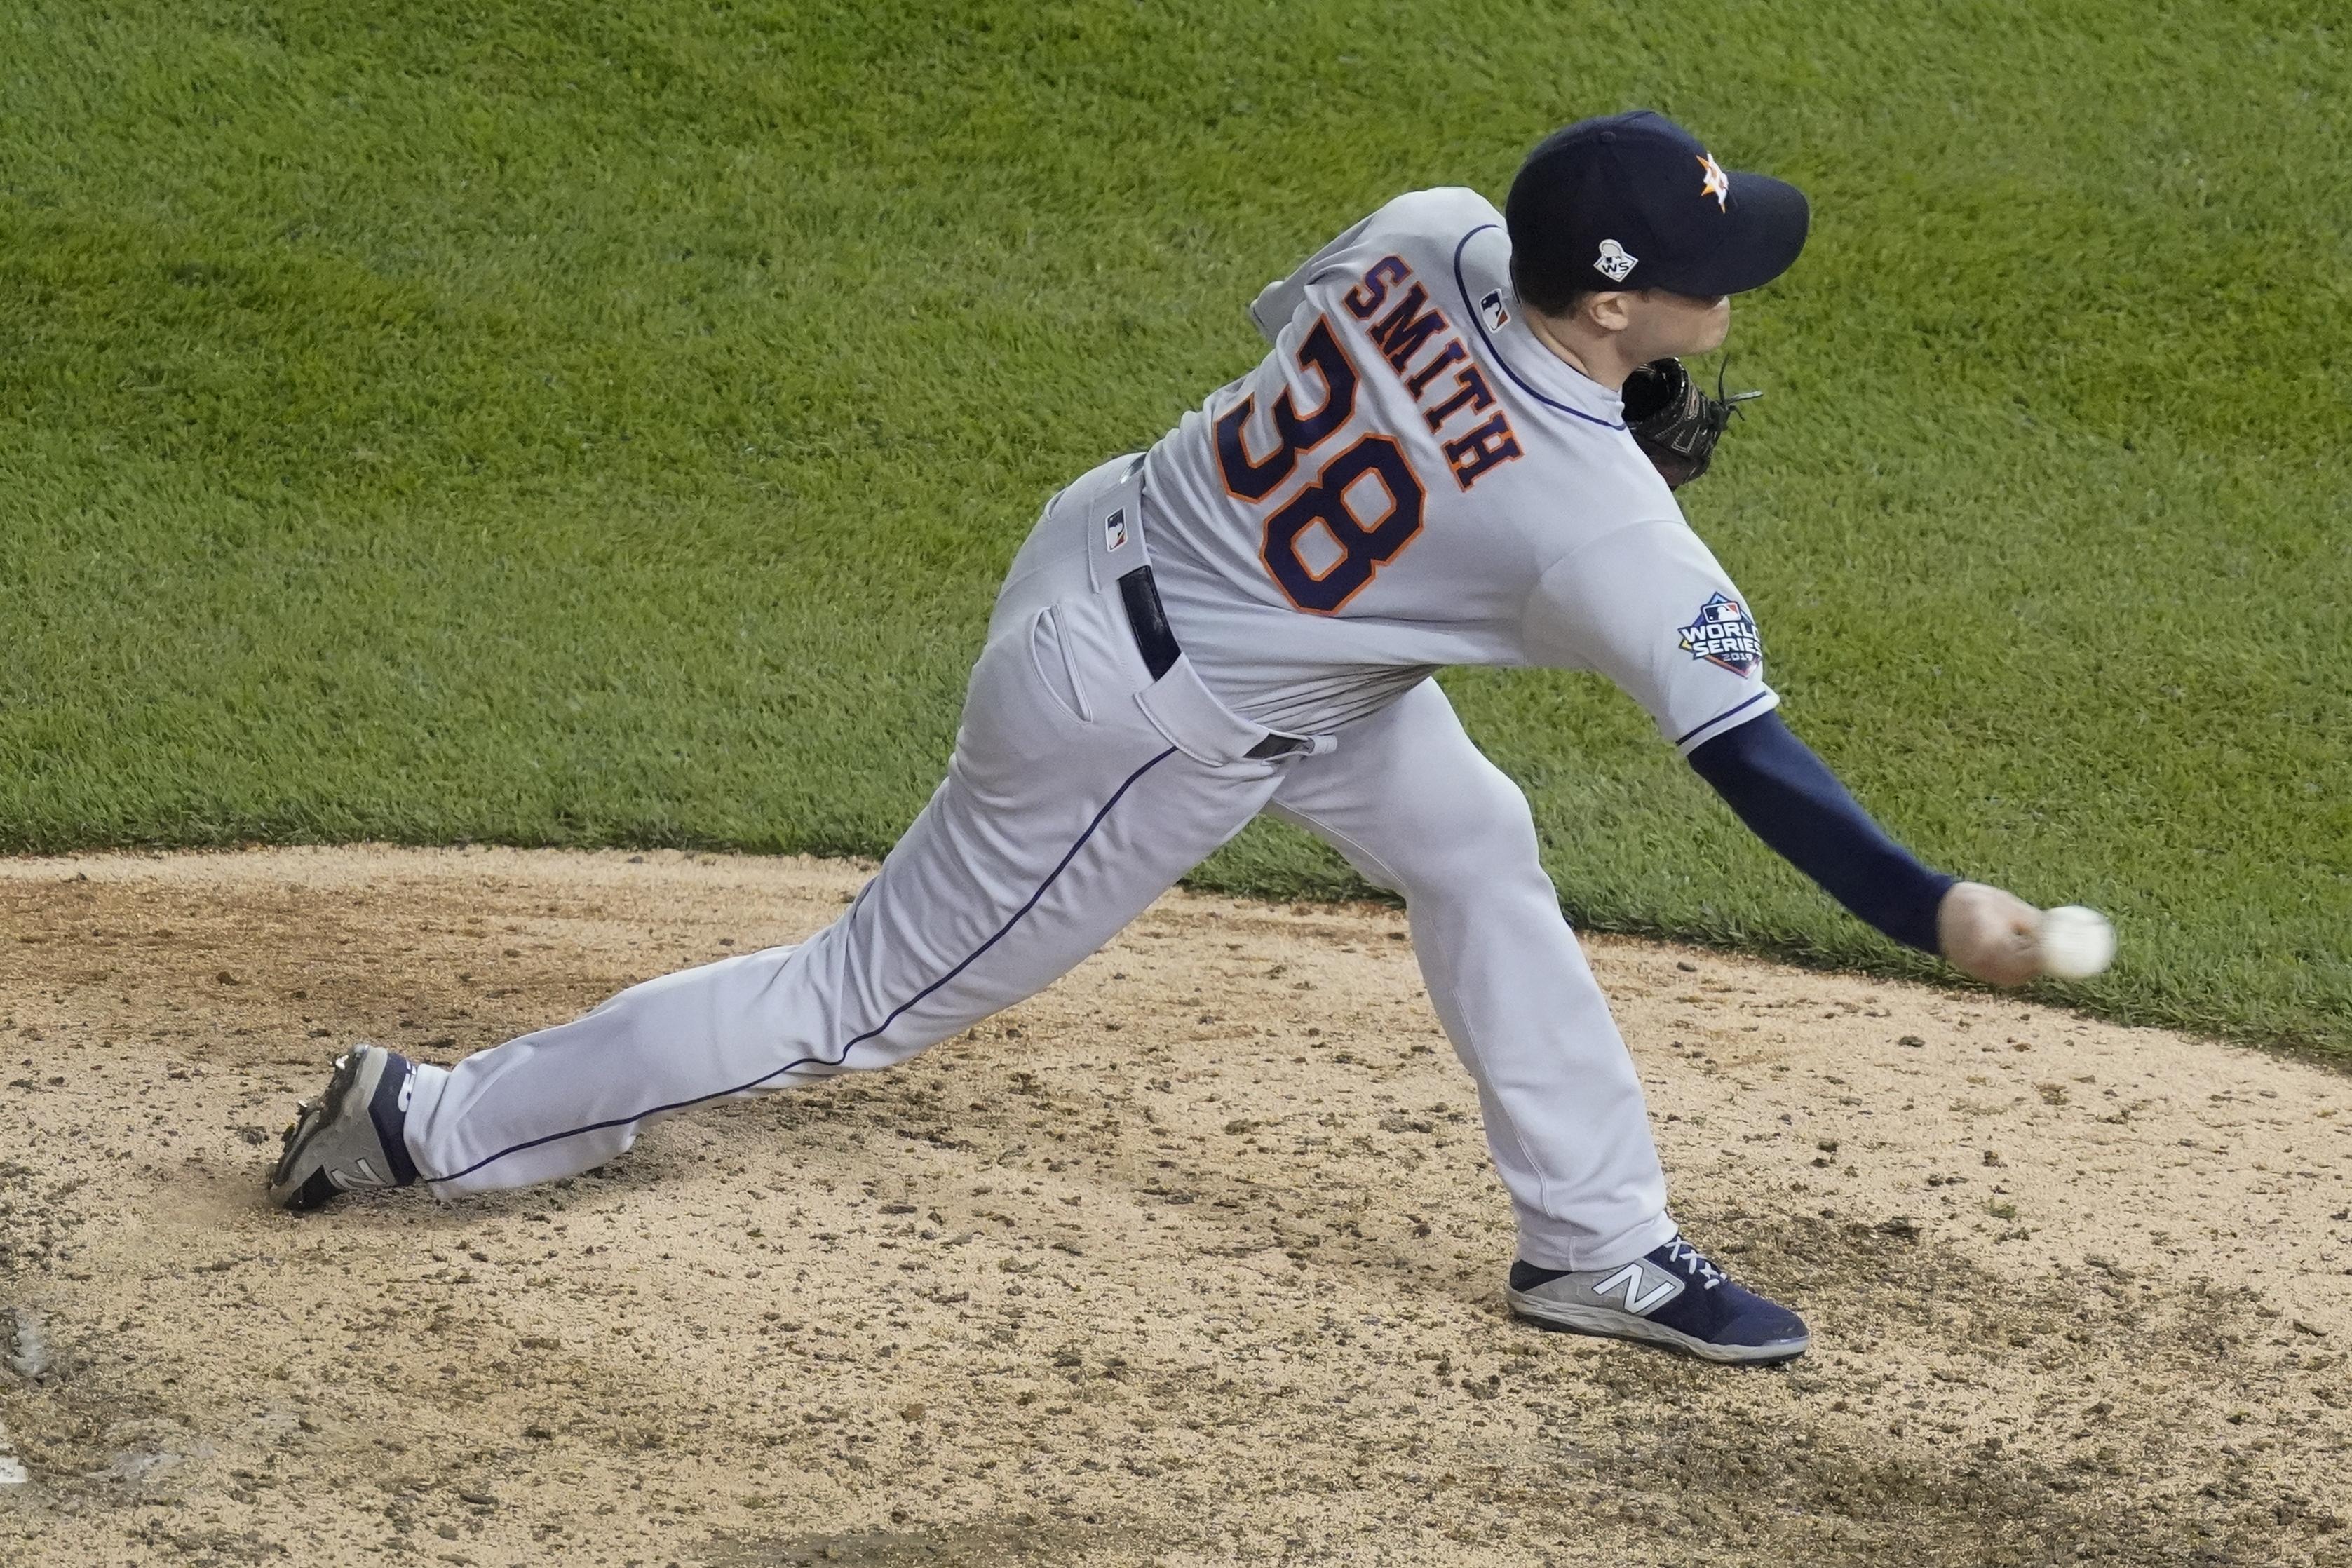 Astros' Joe Smith honors late Tyler Skaggs in World Series